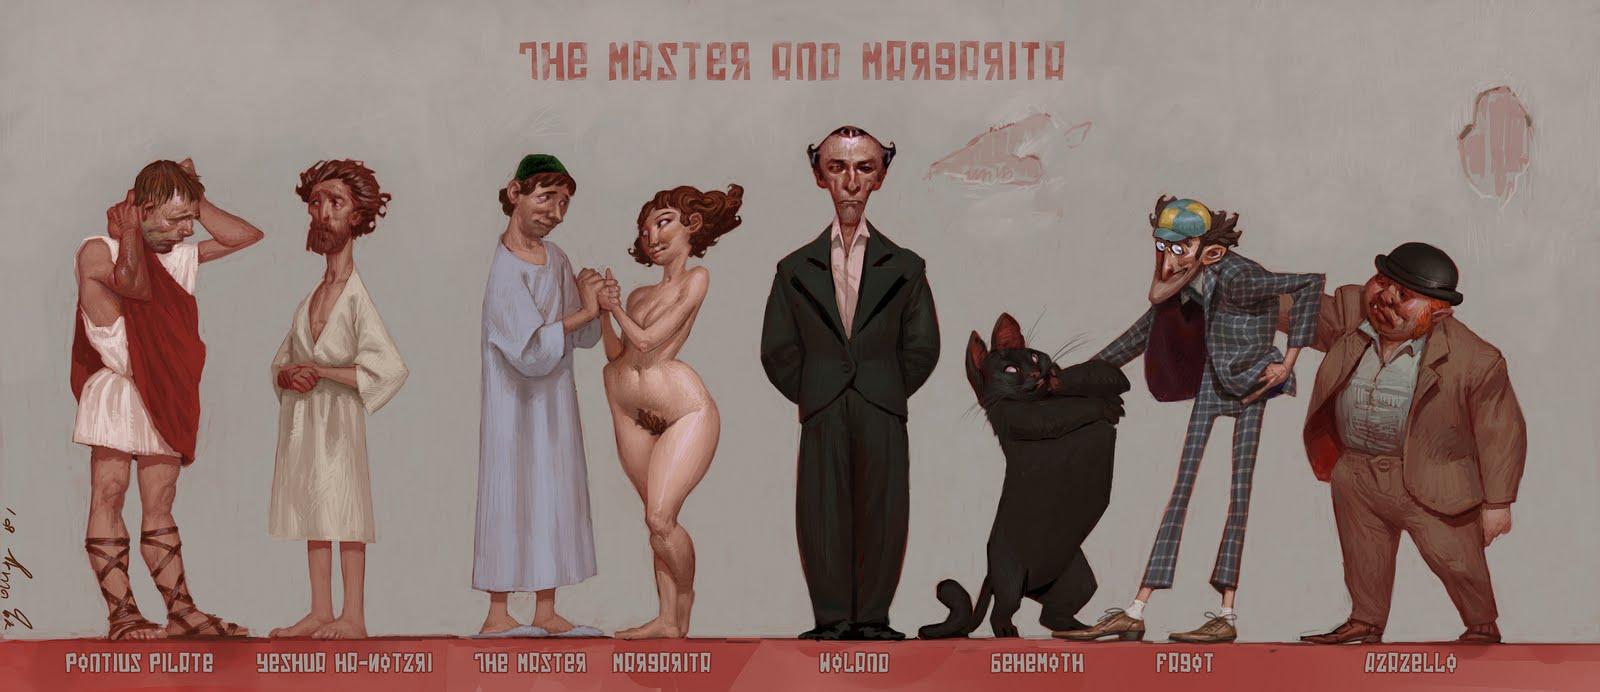 assafho_master_and_margarita